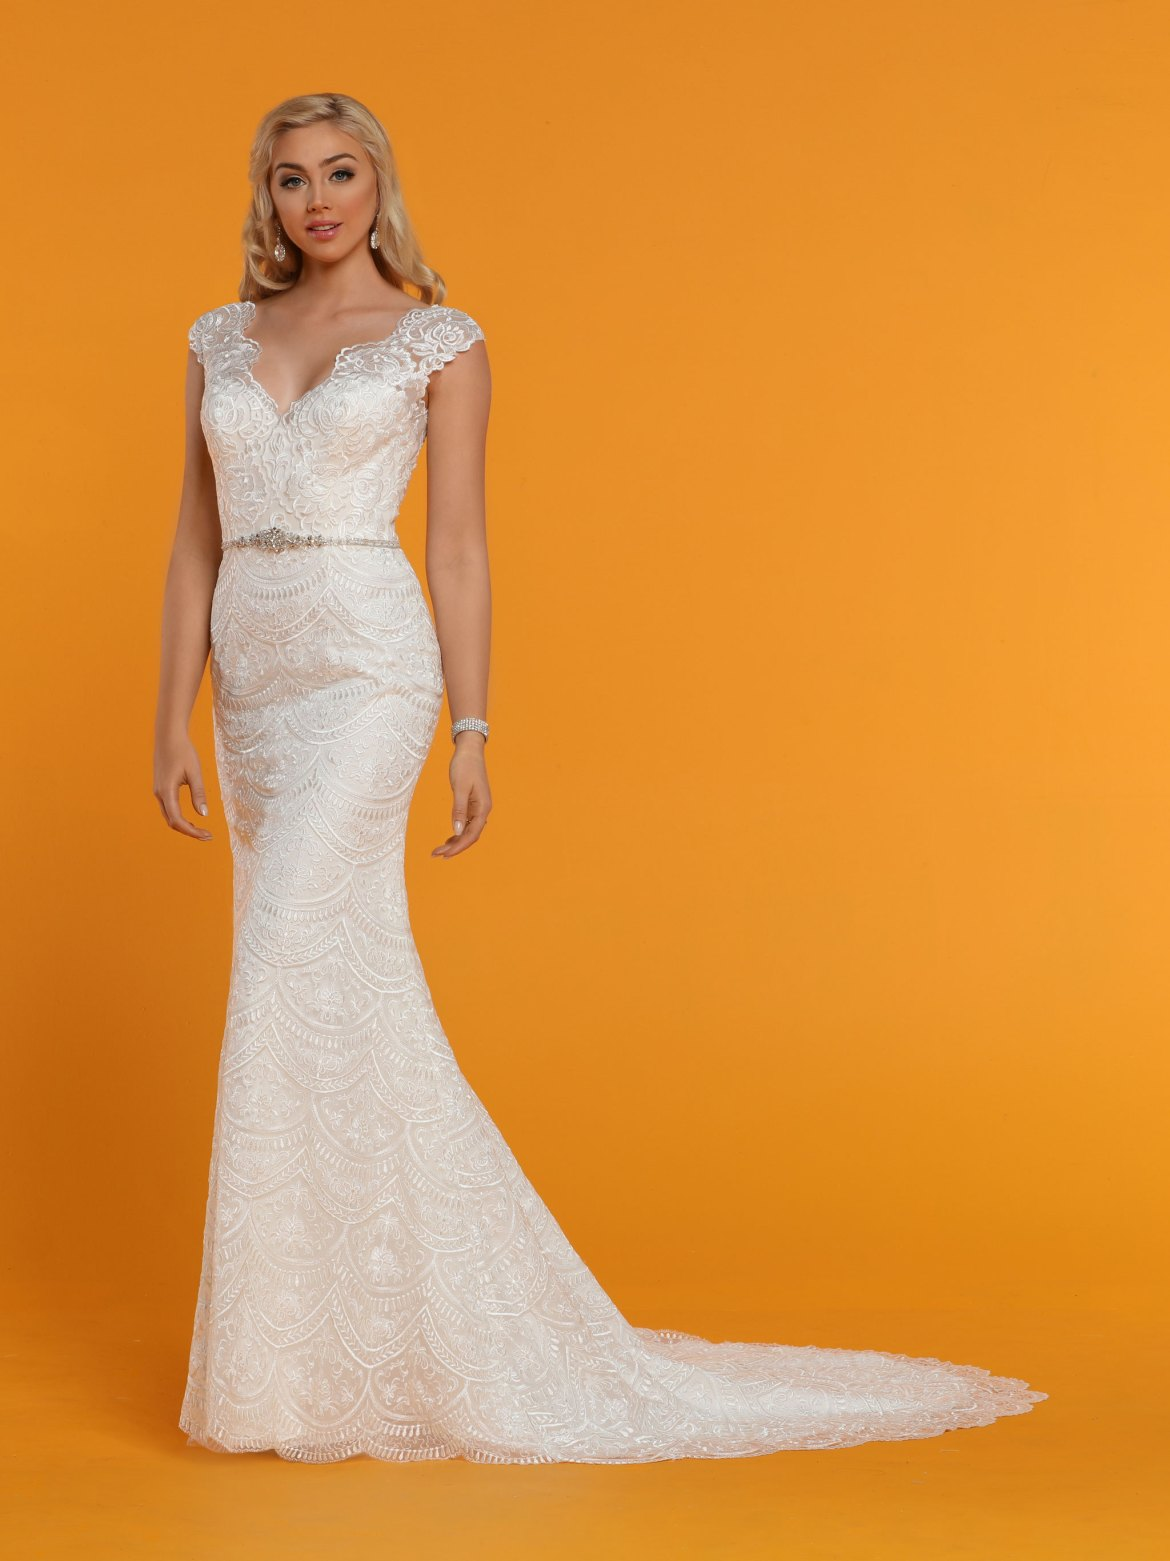 73e00c42c75 Stunning Wedding Dresses with Sleeves   Jackets - DaVinci Bridal Blog